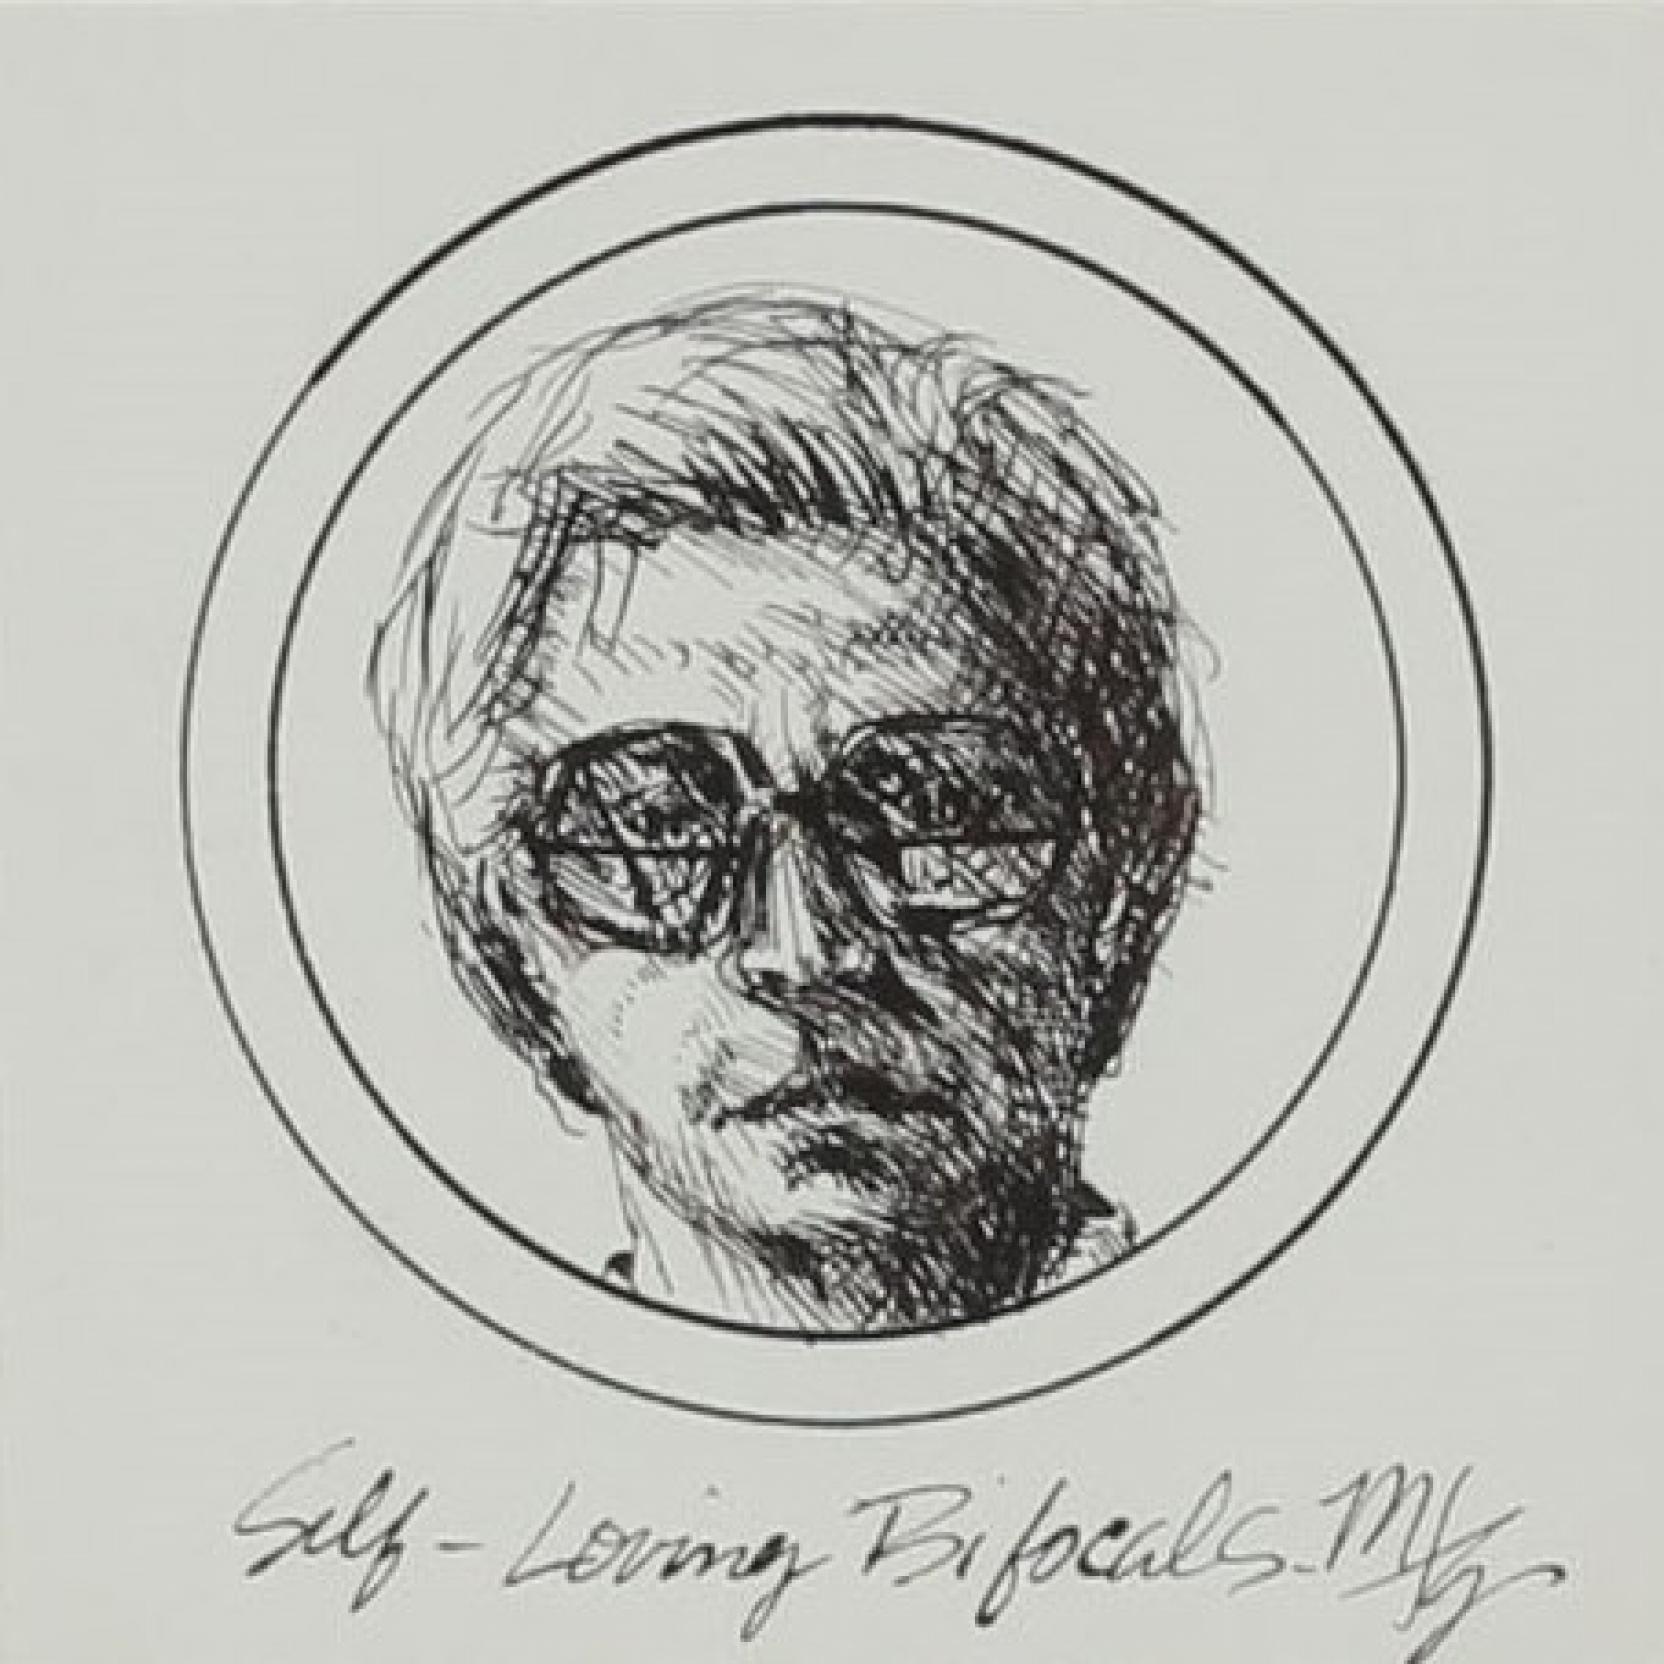 maud-gatewood-nc-1934-2004-self-portrait